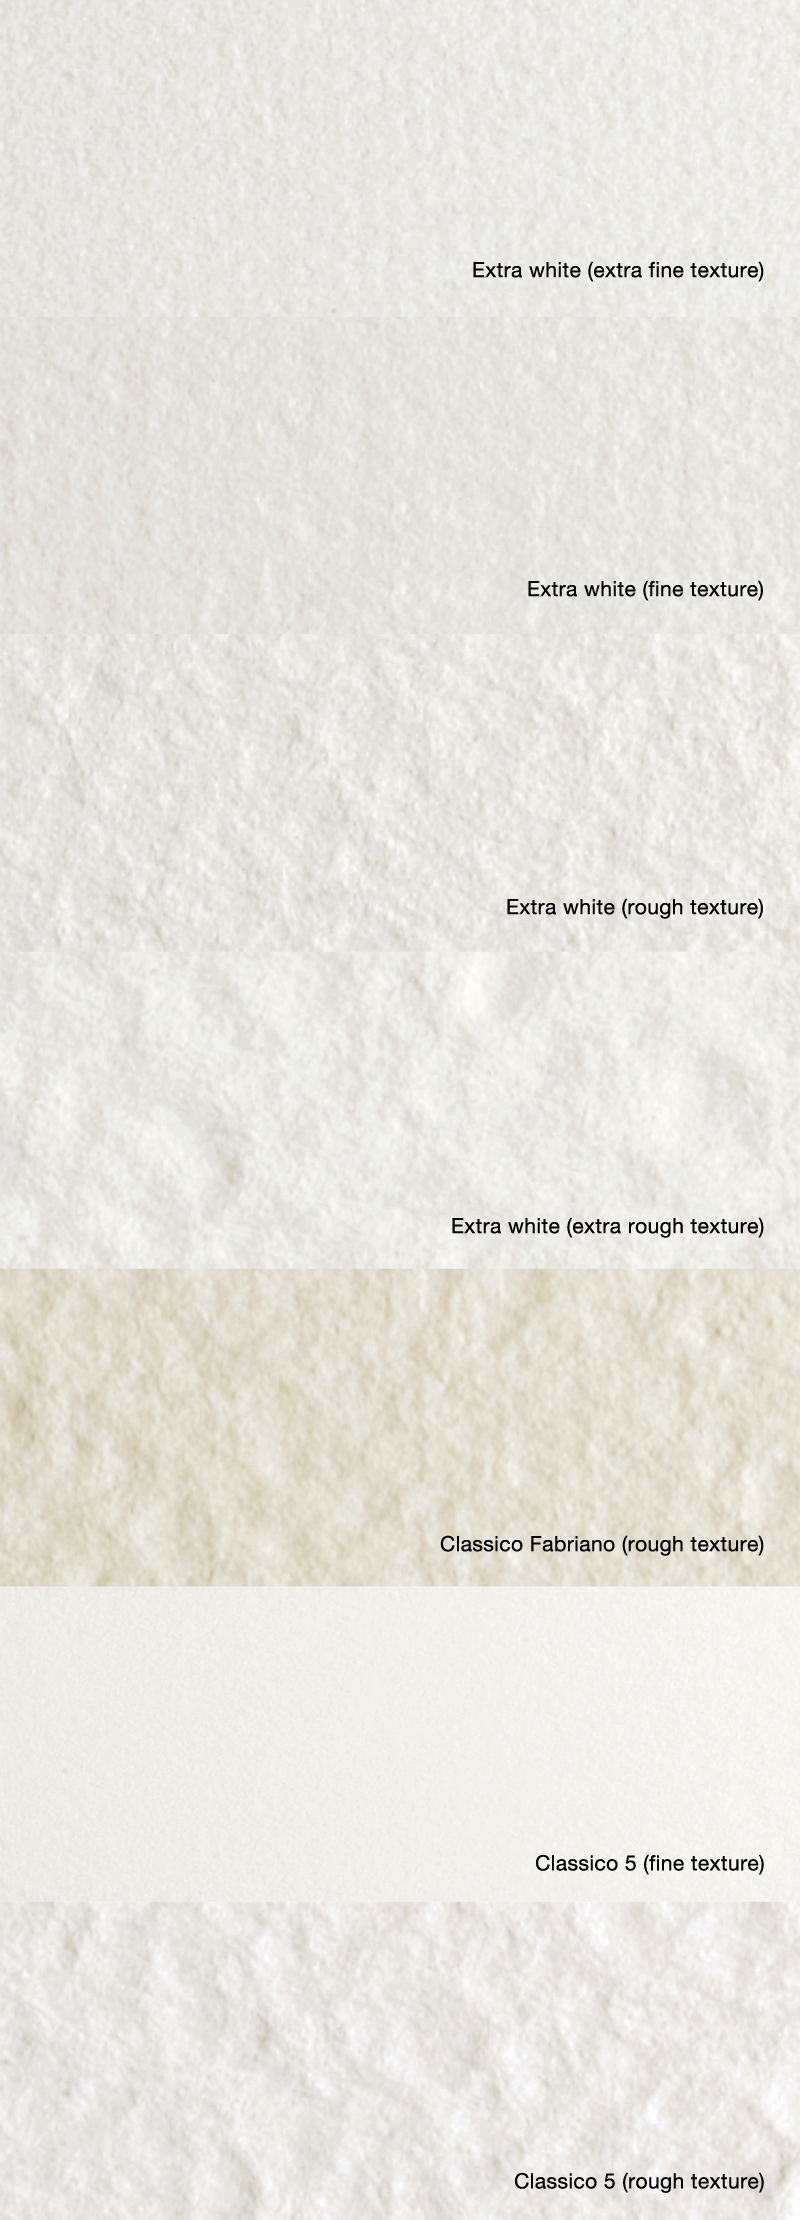 Fabriano watercolor paper (close-up)